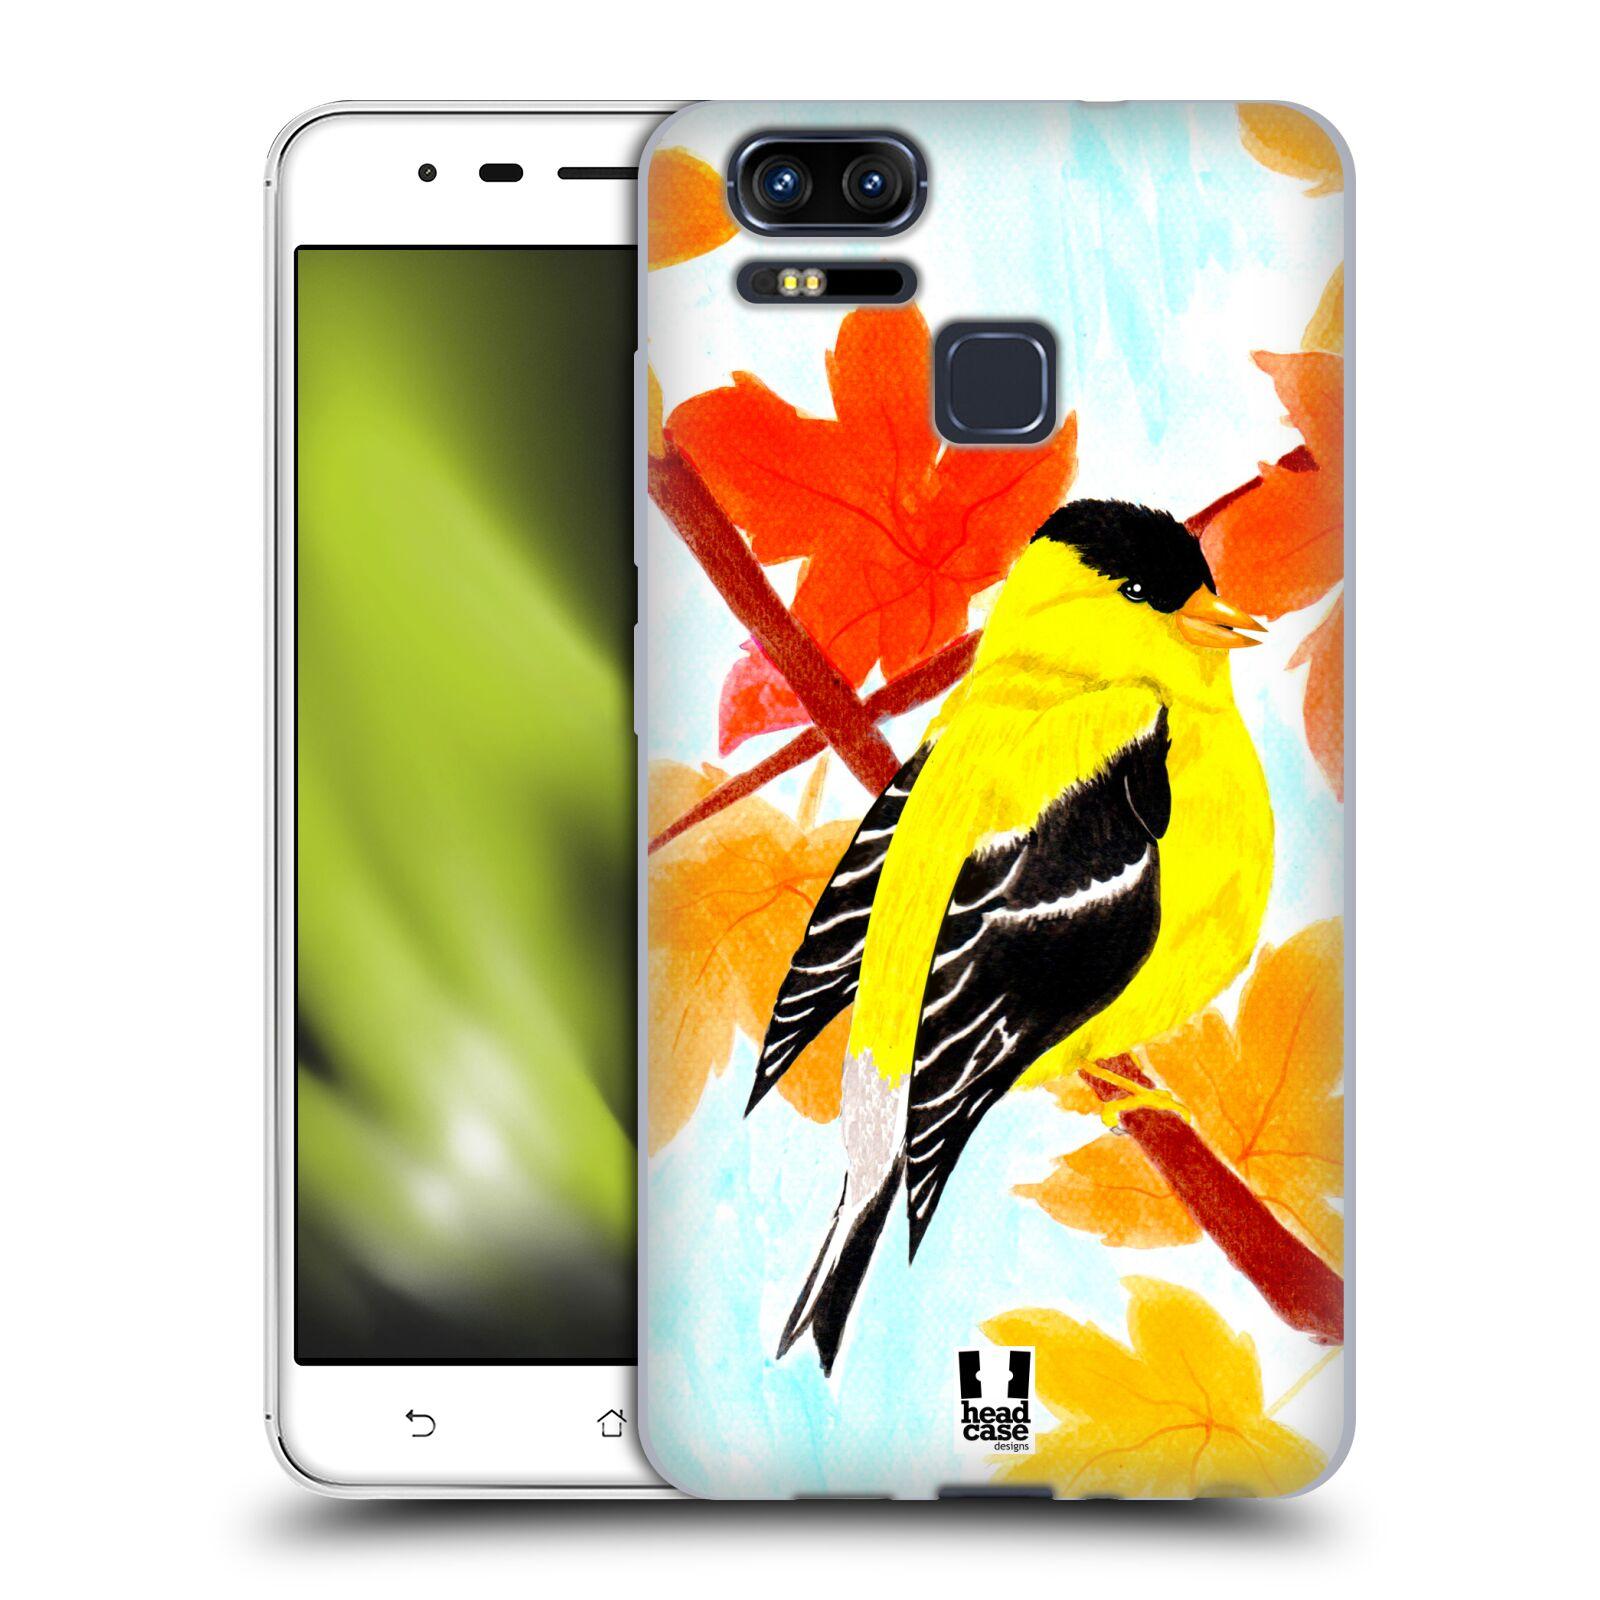 HEAD-CASE-DESIGNS-AUTUMN-BIRDS-SOFT-GEL-CASE-FOR-ASUS-ZENFONE-3-ZOOM-ZE553KL